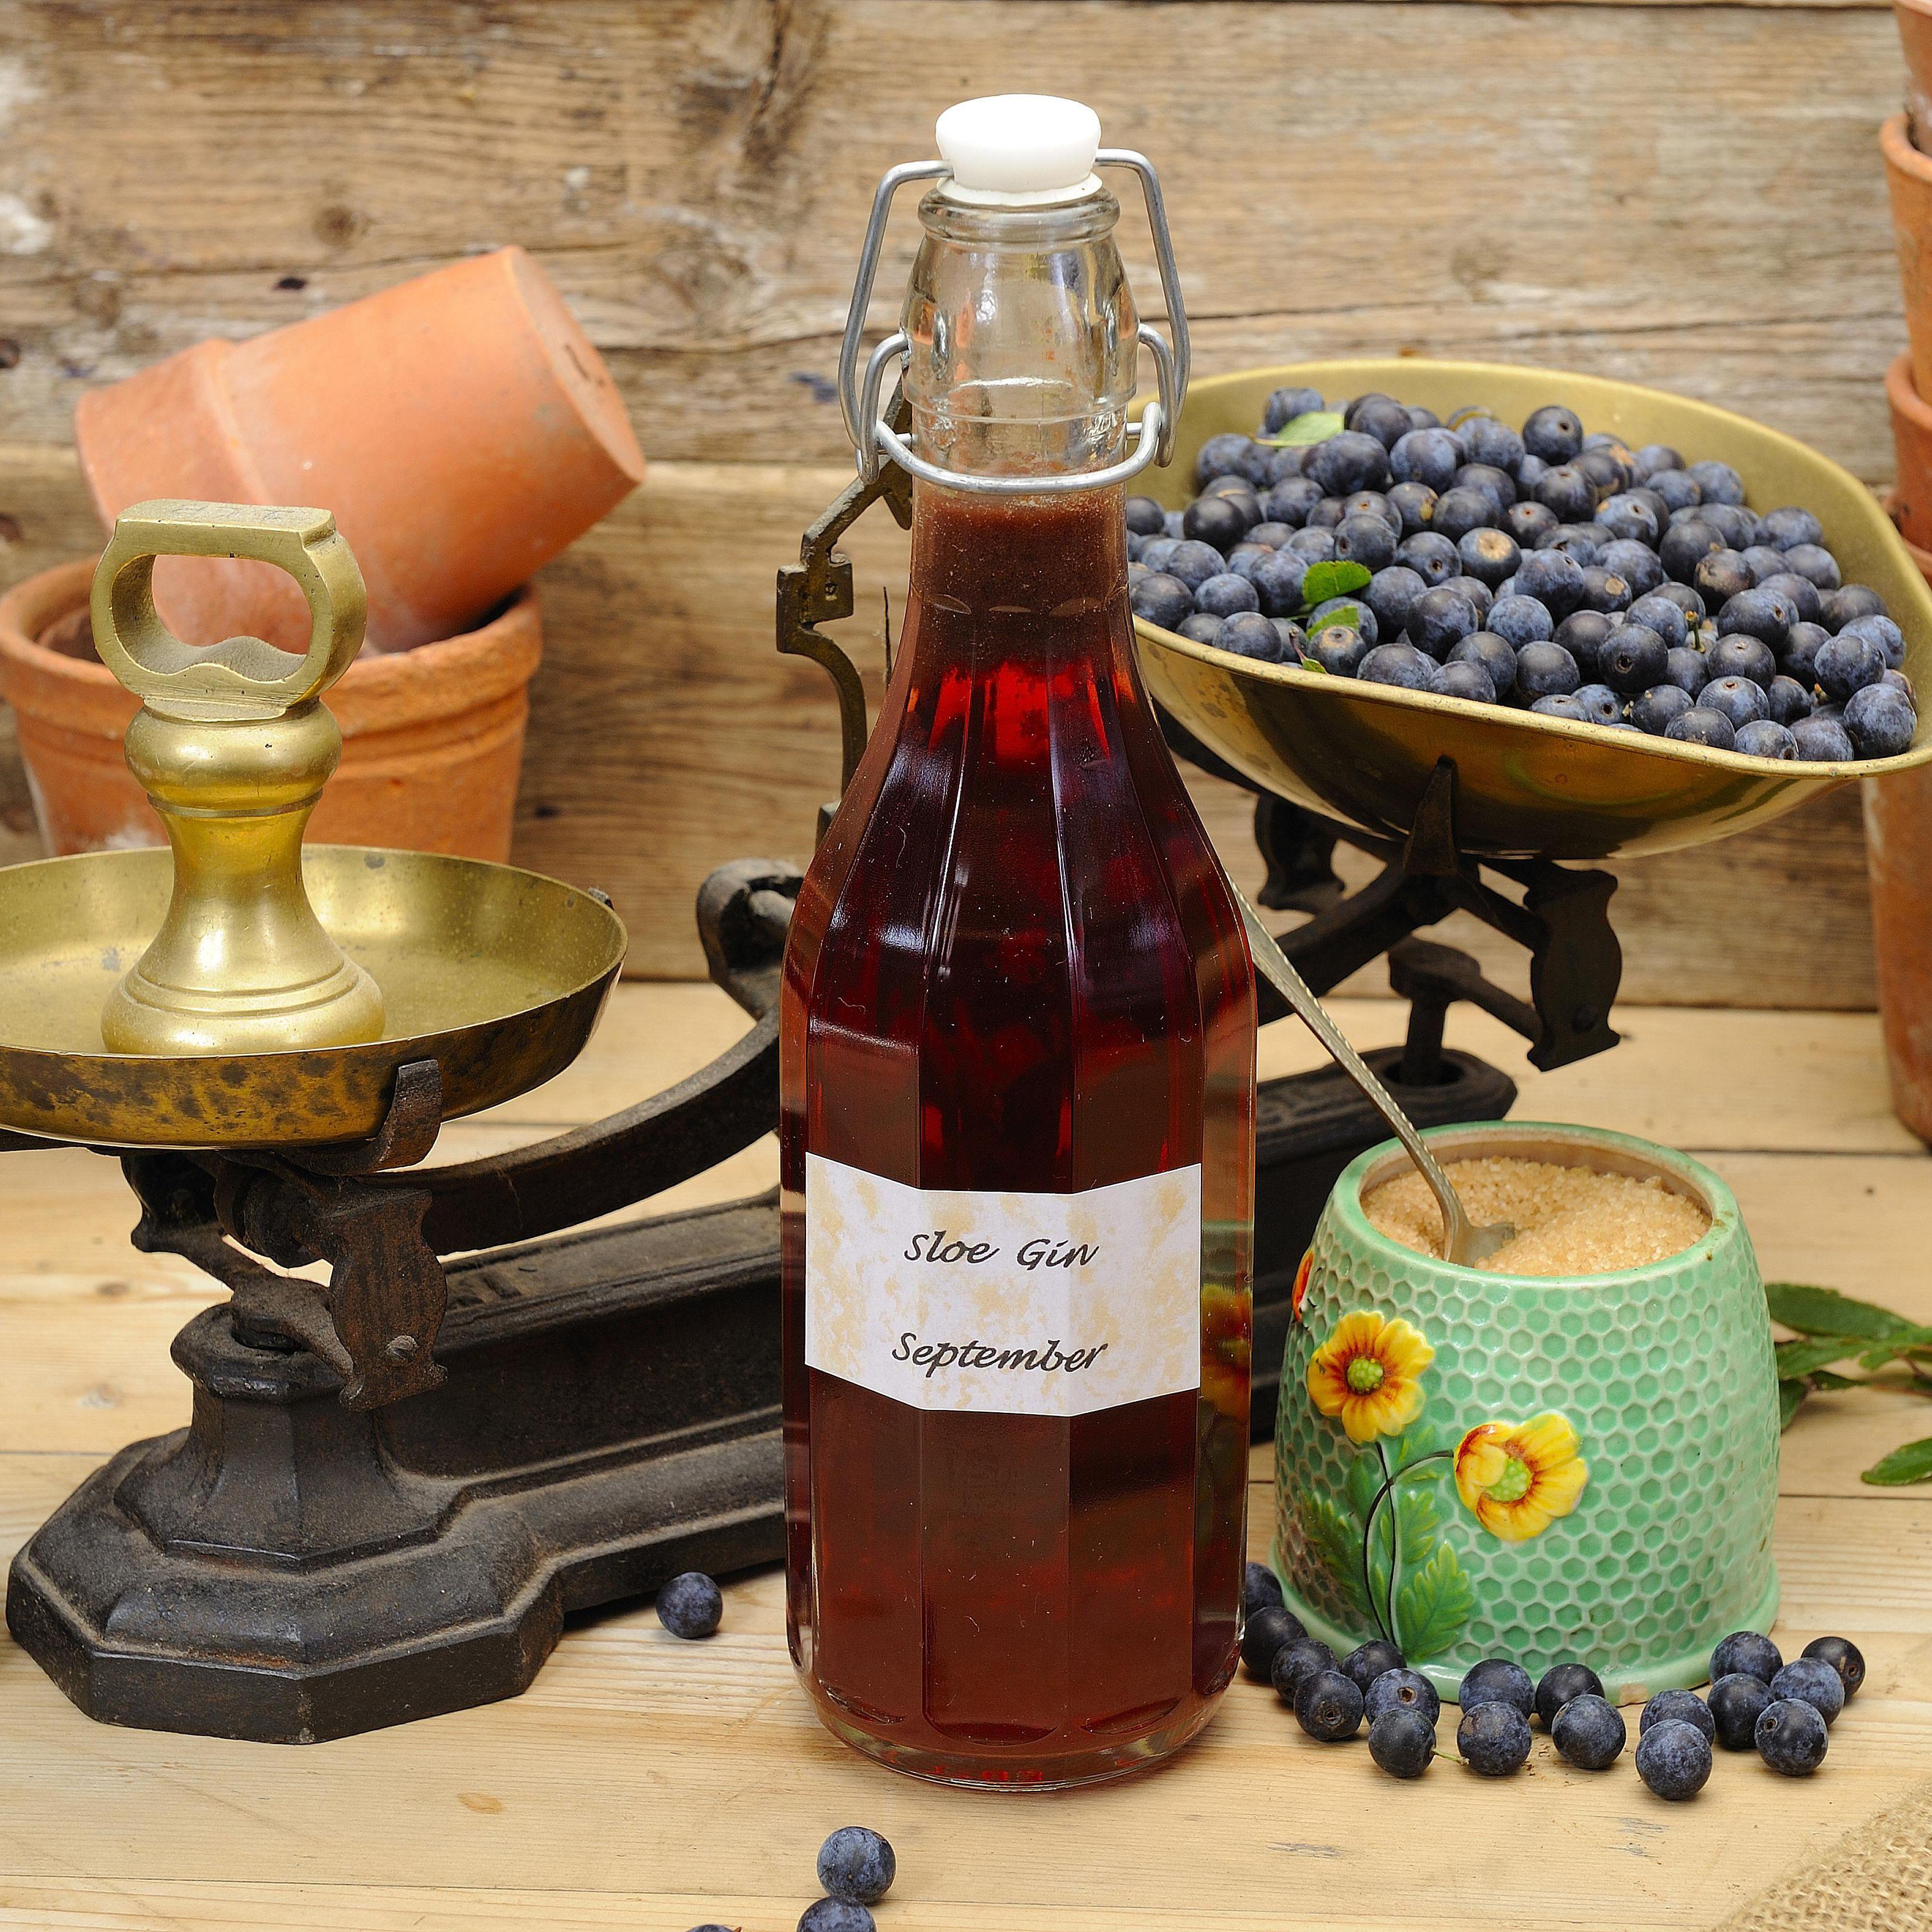 How To Make Sloe Gin >> How To Make Homemade Sloe Gin